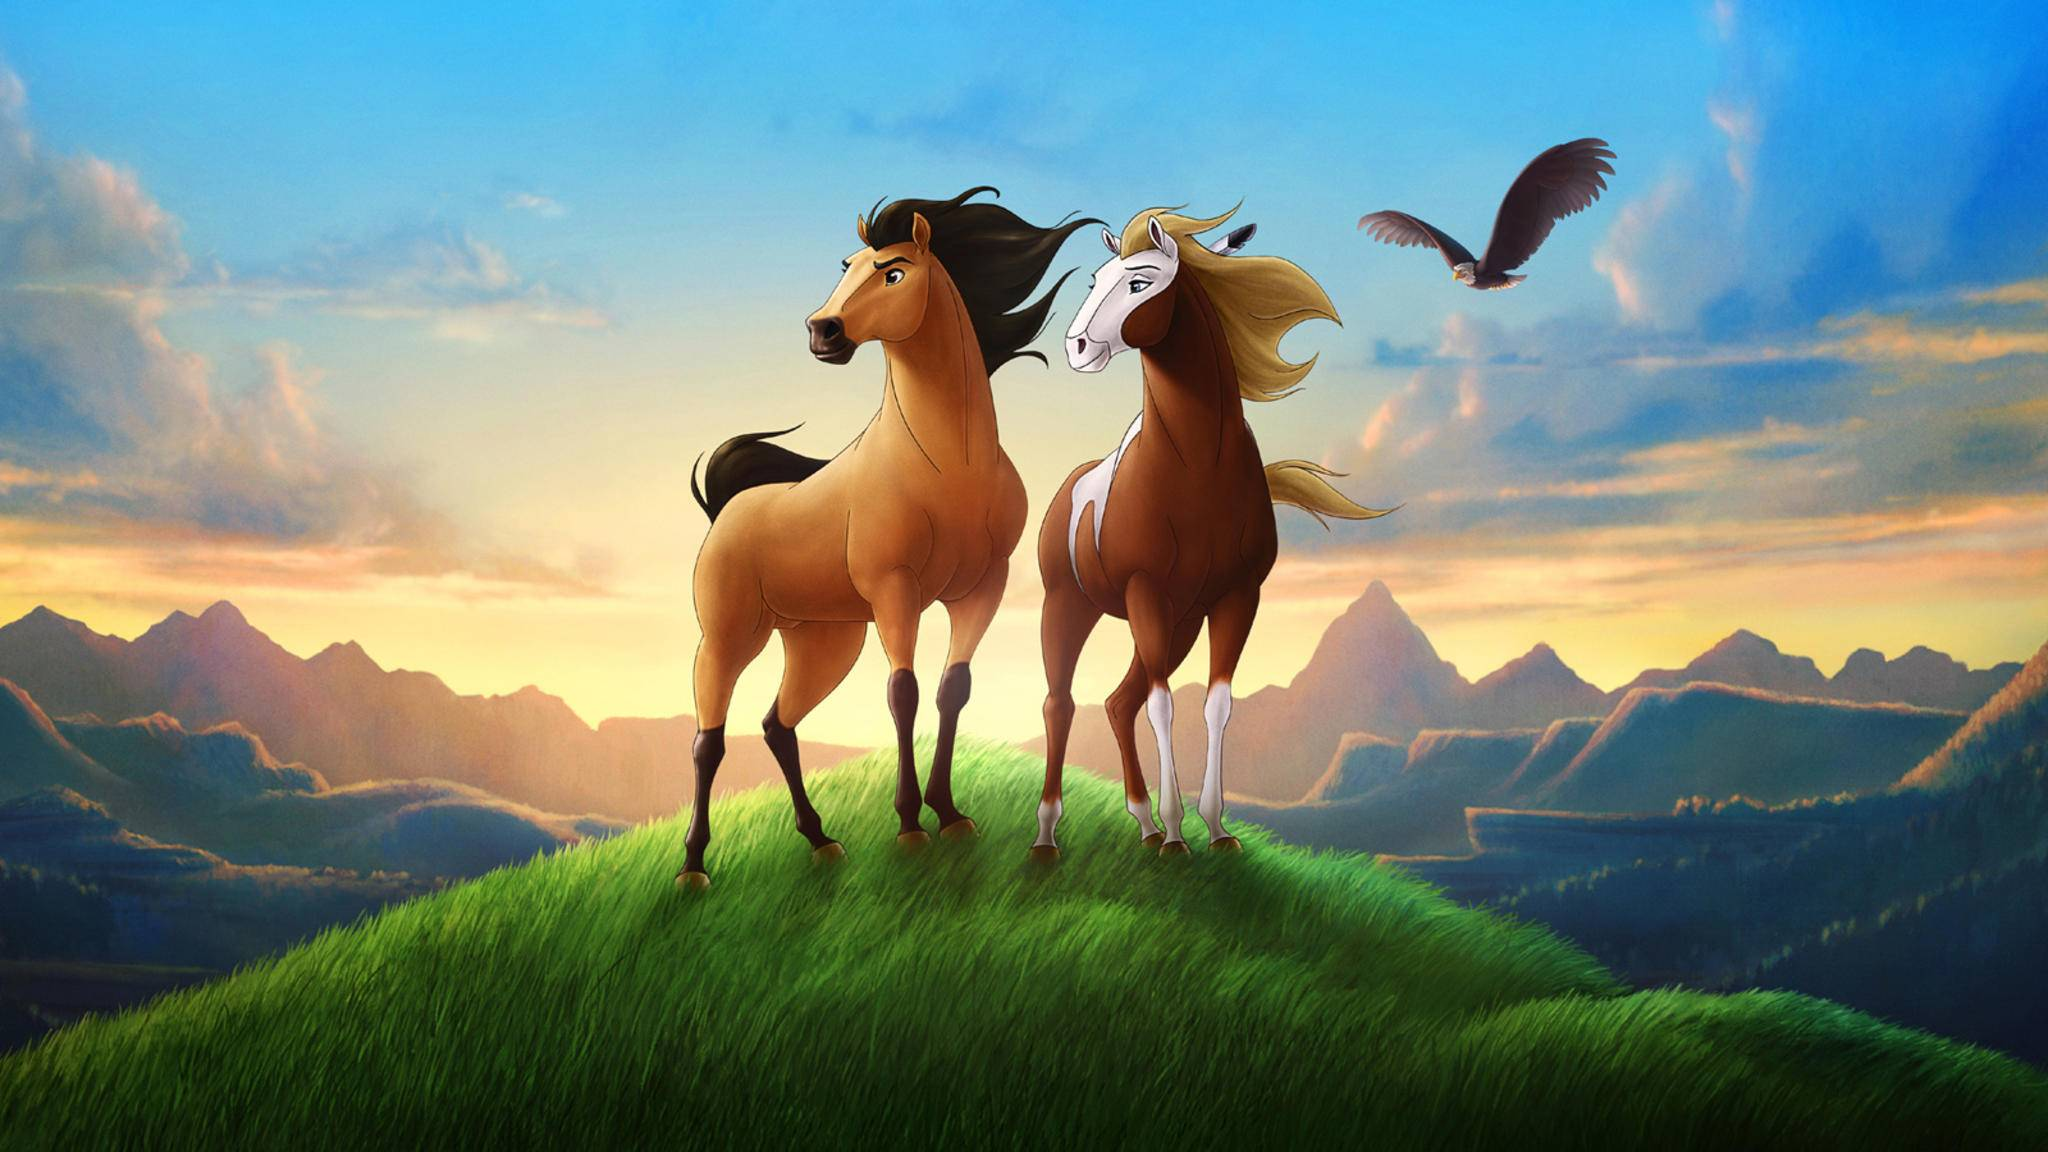 Spirit der wilde Mustang Universal Pictures Home Entertainment